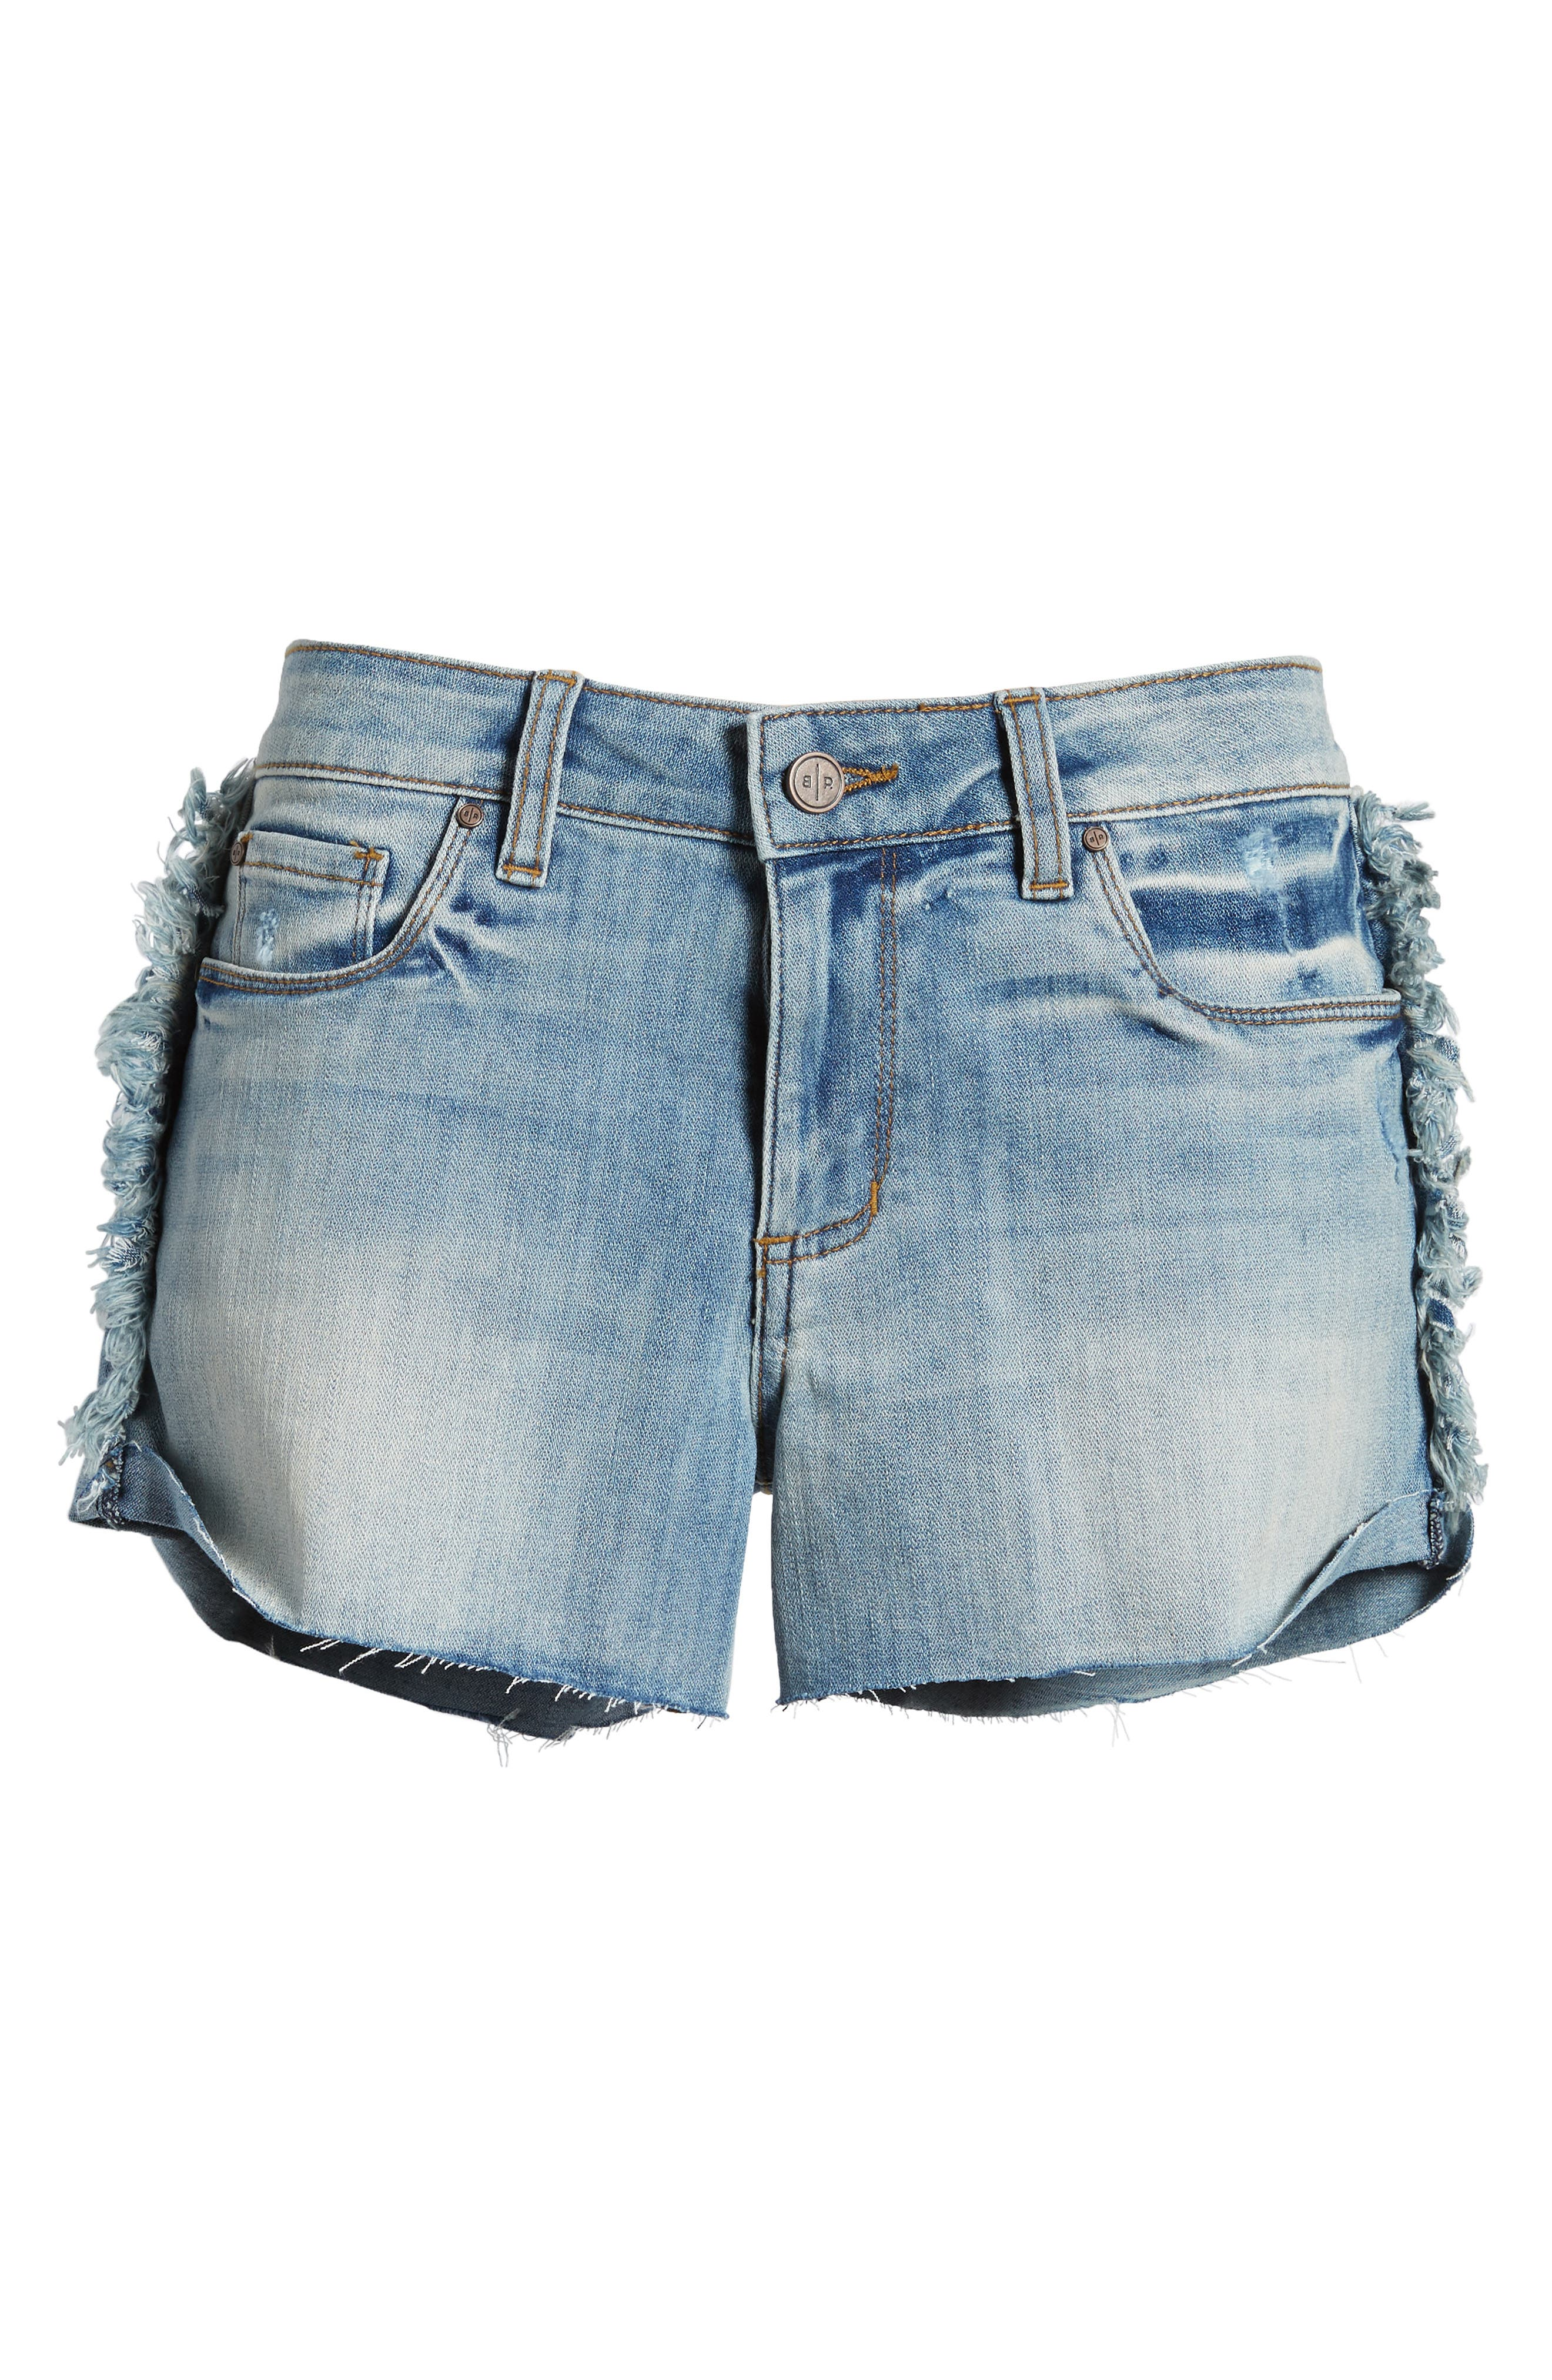 Fray Outseam Denim Shorts,                             Alternate thumbnail 7, color,                             420